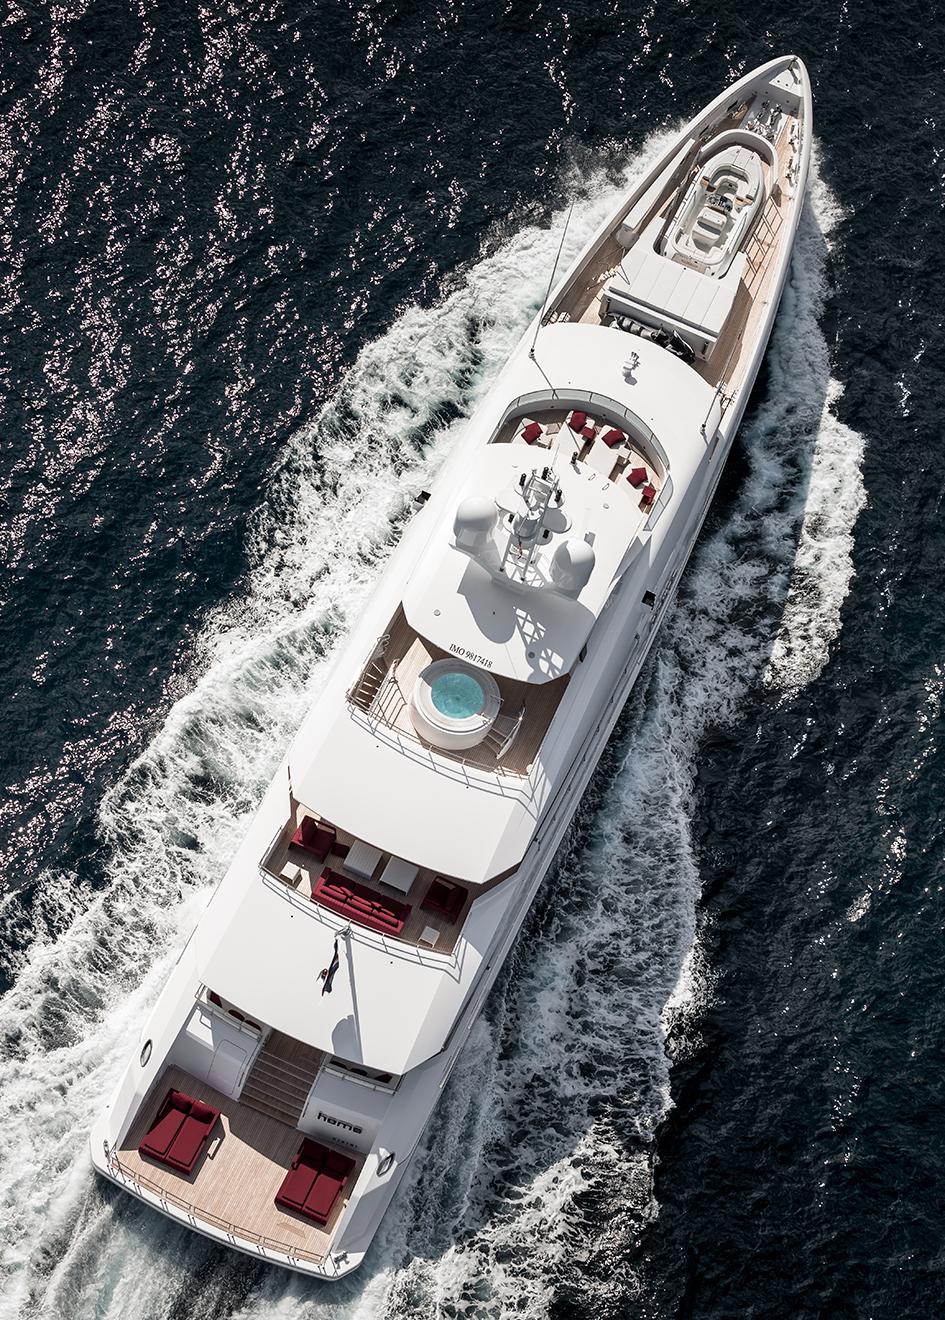 aerial-running-shot-of-the-50-metre-heesen-motor-yacht-home-credit-jeff-brown-breed-media